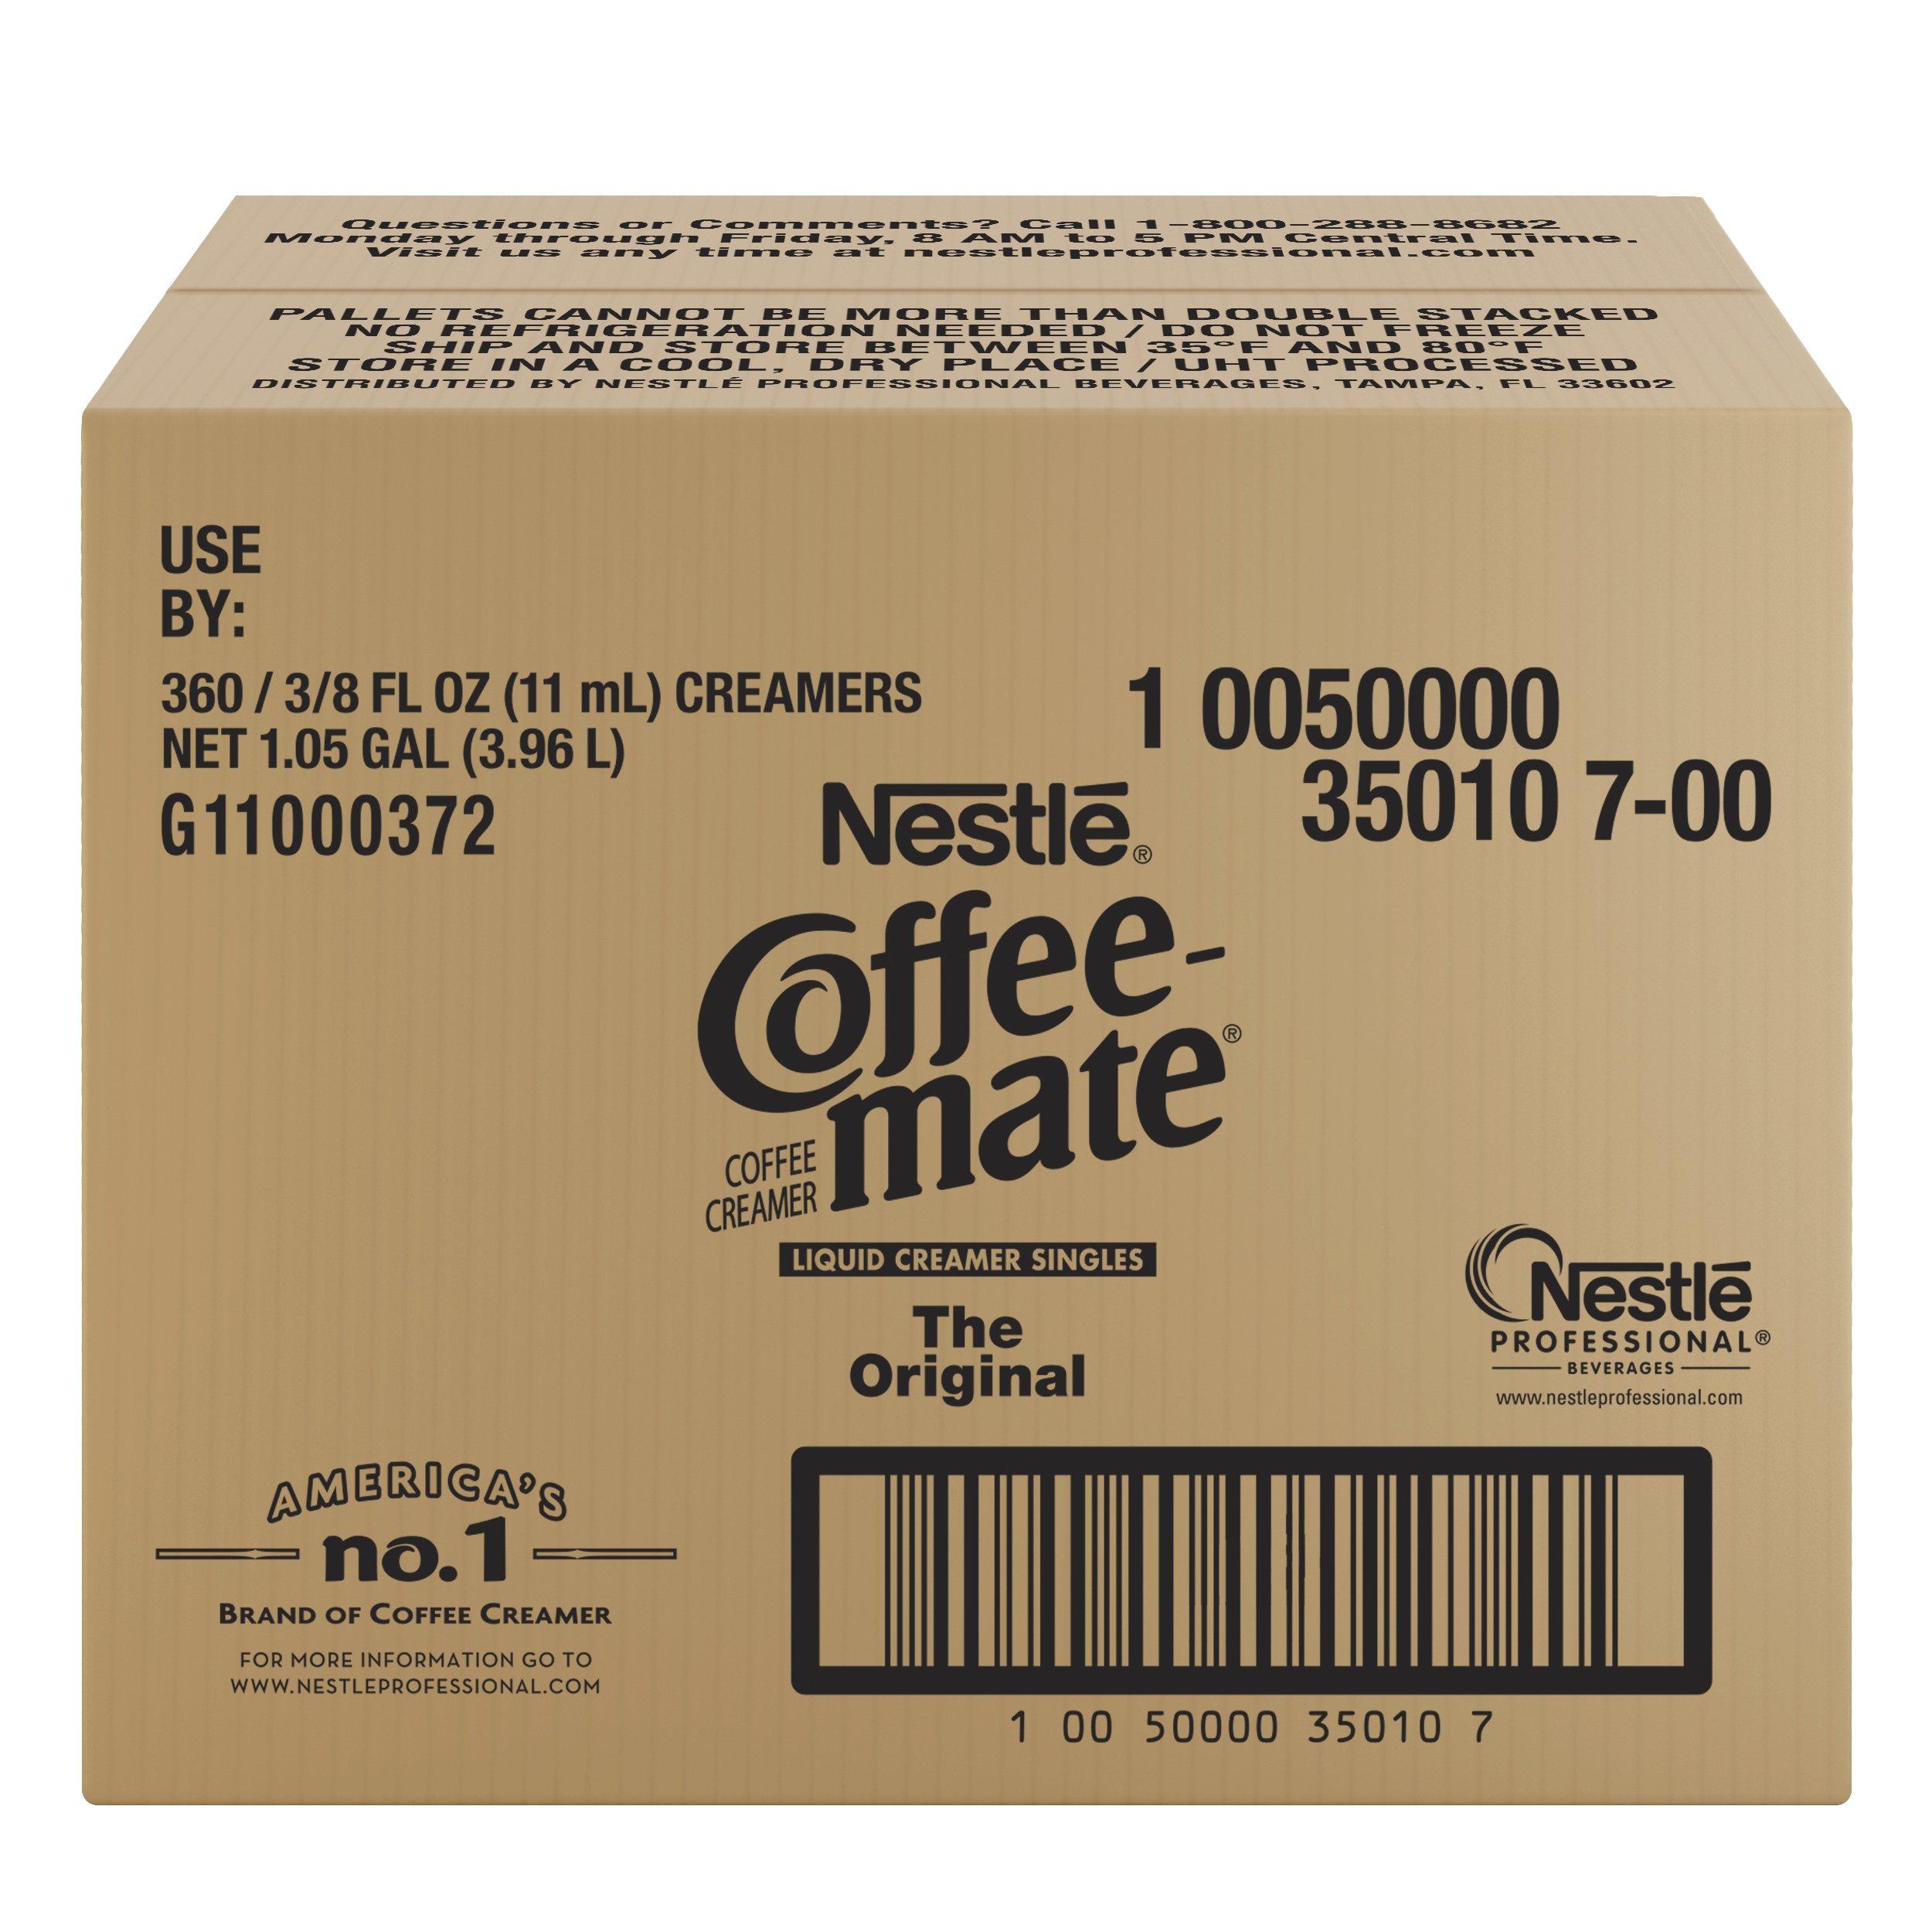 NESTLE COFFEE-MATE Coffee Creamer, Original, liquid creamer singles, 360 Count (Pack of 1) by Nestle Coffee Mate (Image #3)